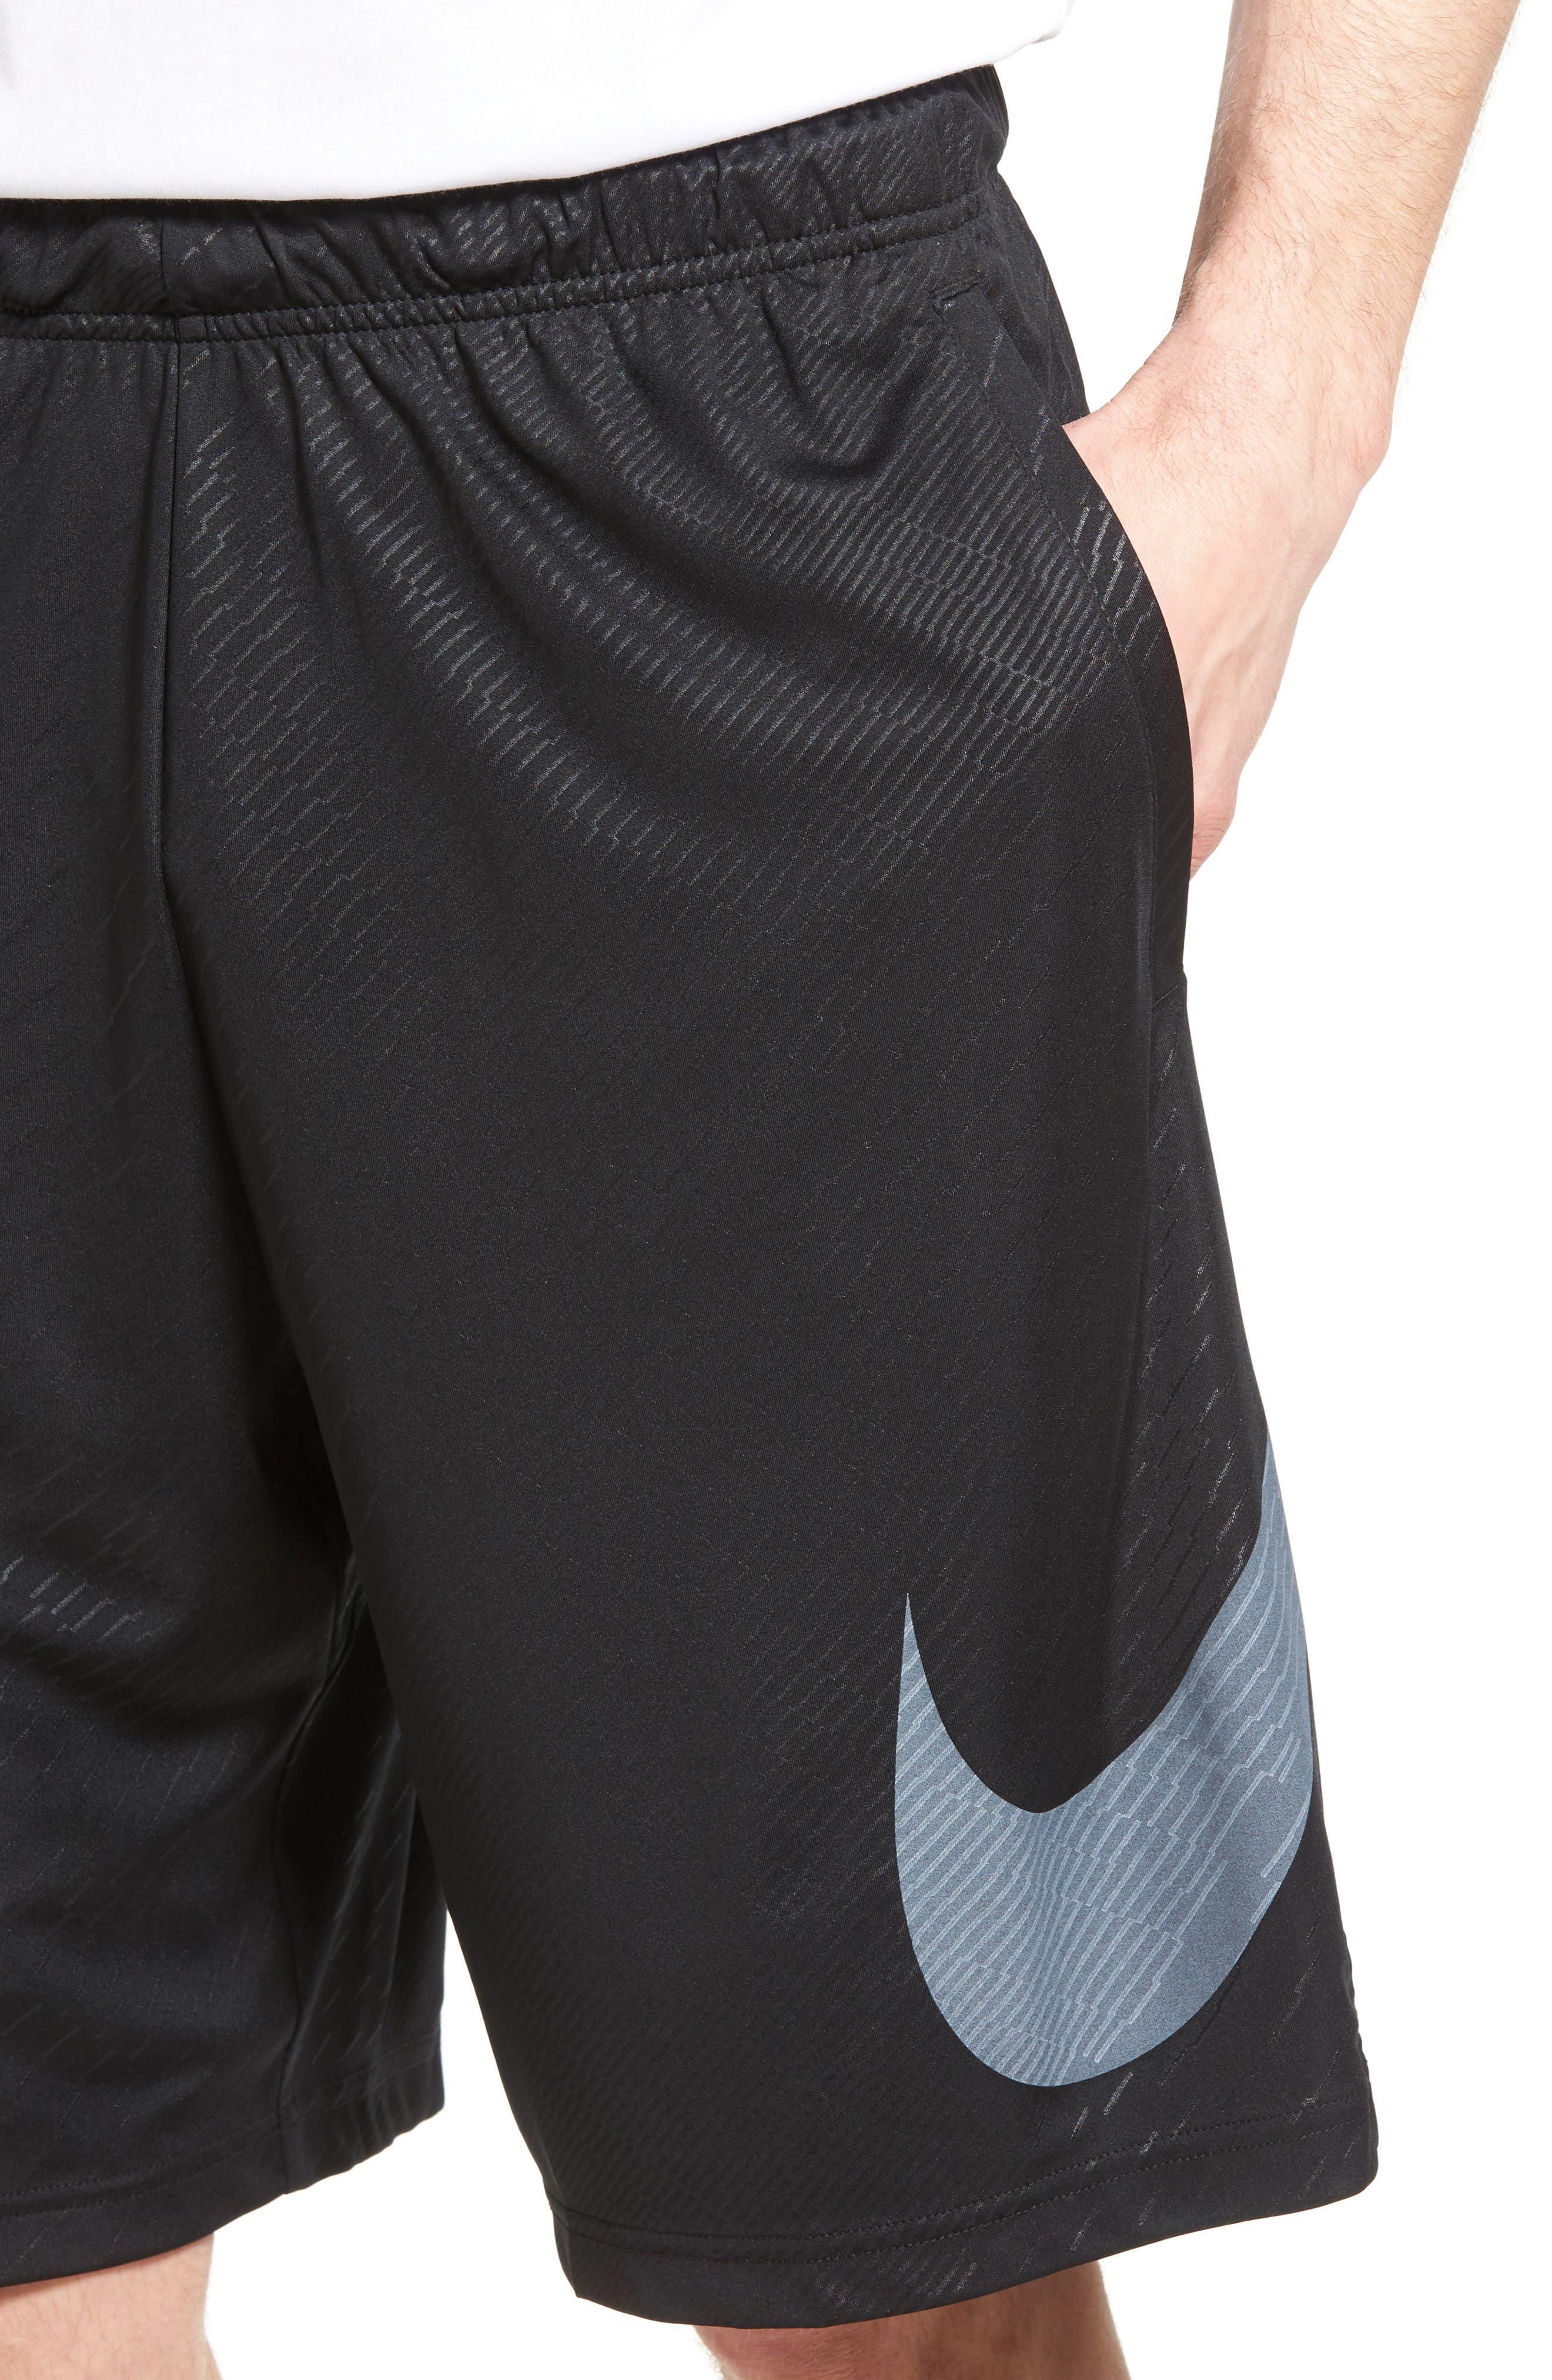 Dry Training Shorts,                             Alternate thumbnail 4, color,                             010